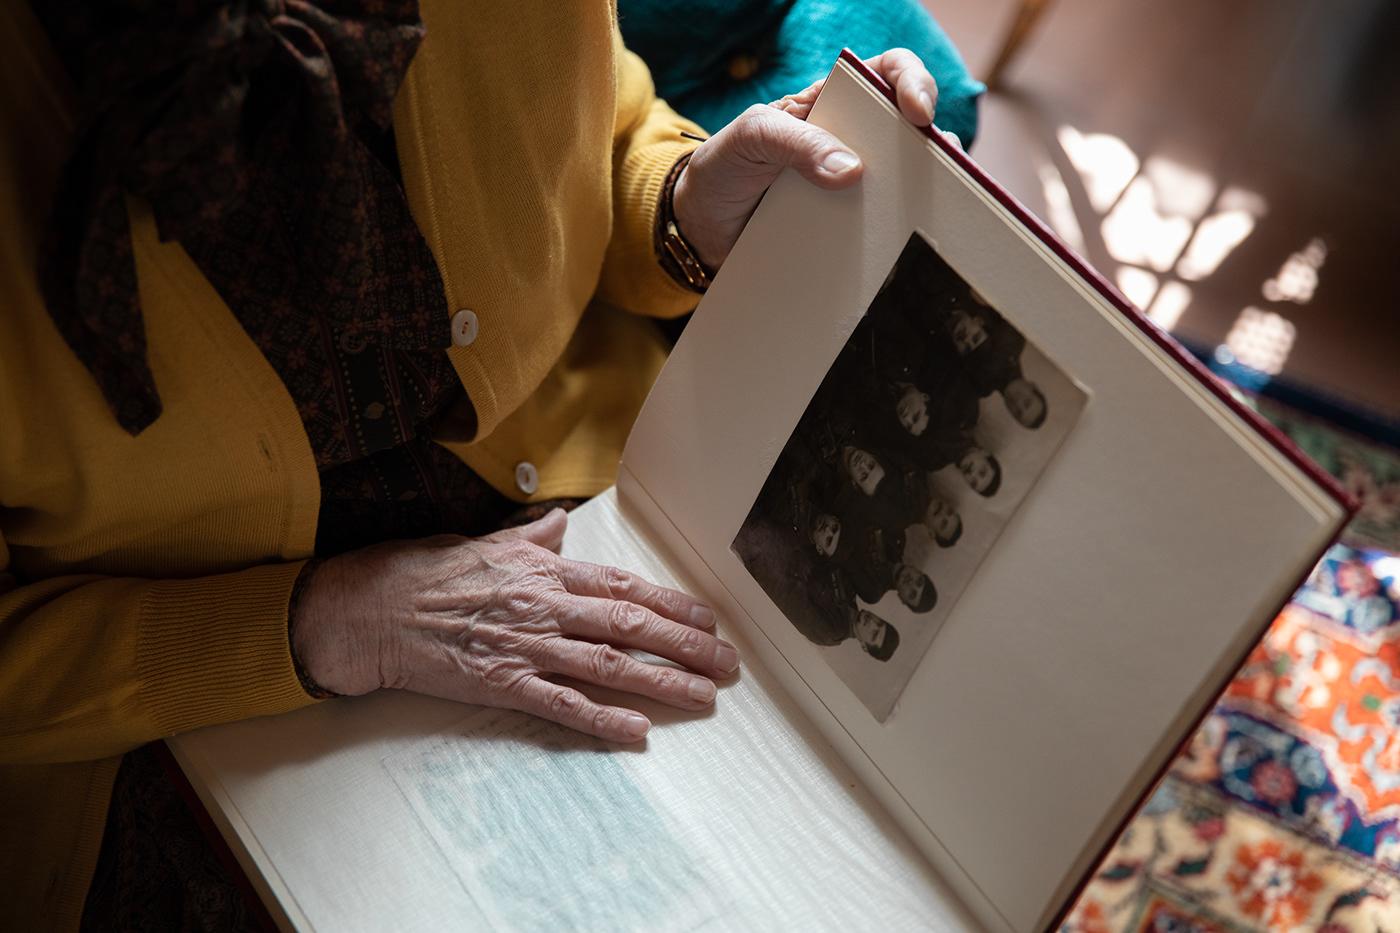 old woman grandmother house living room vintage book hands storytelling   War